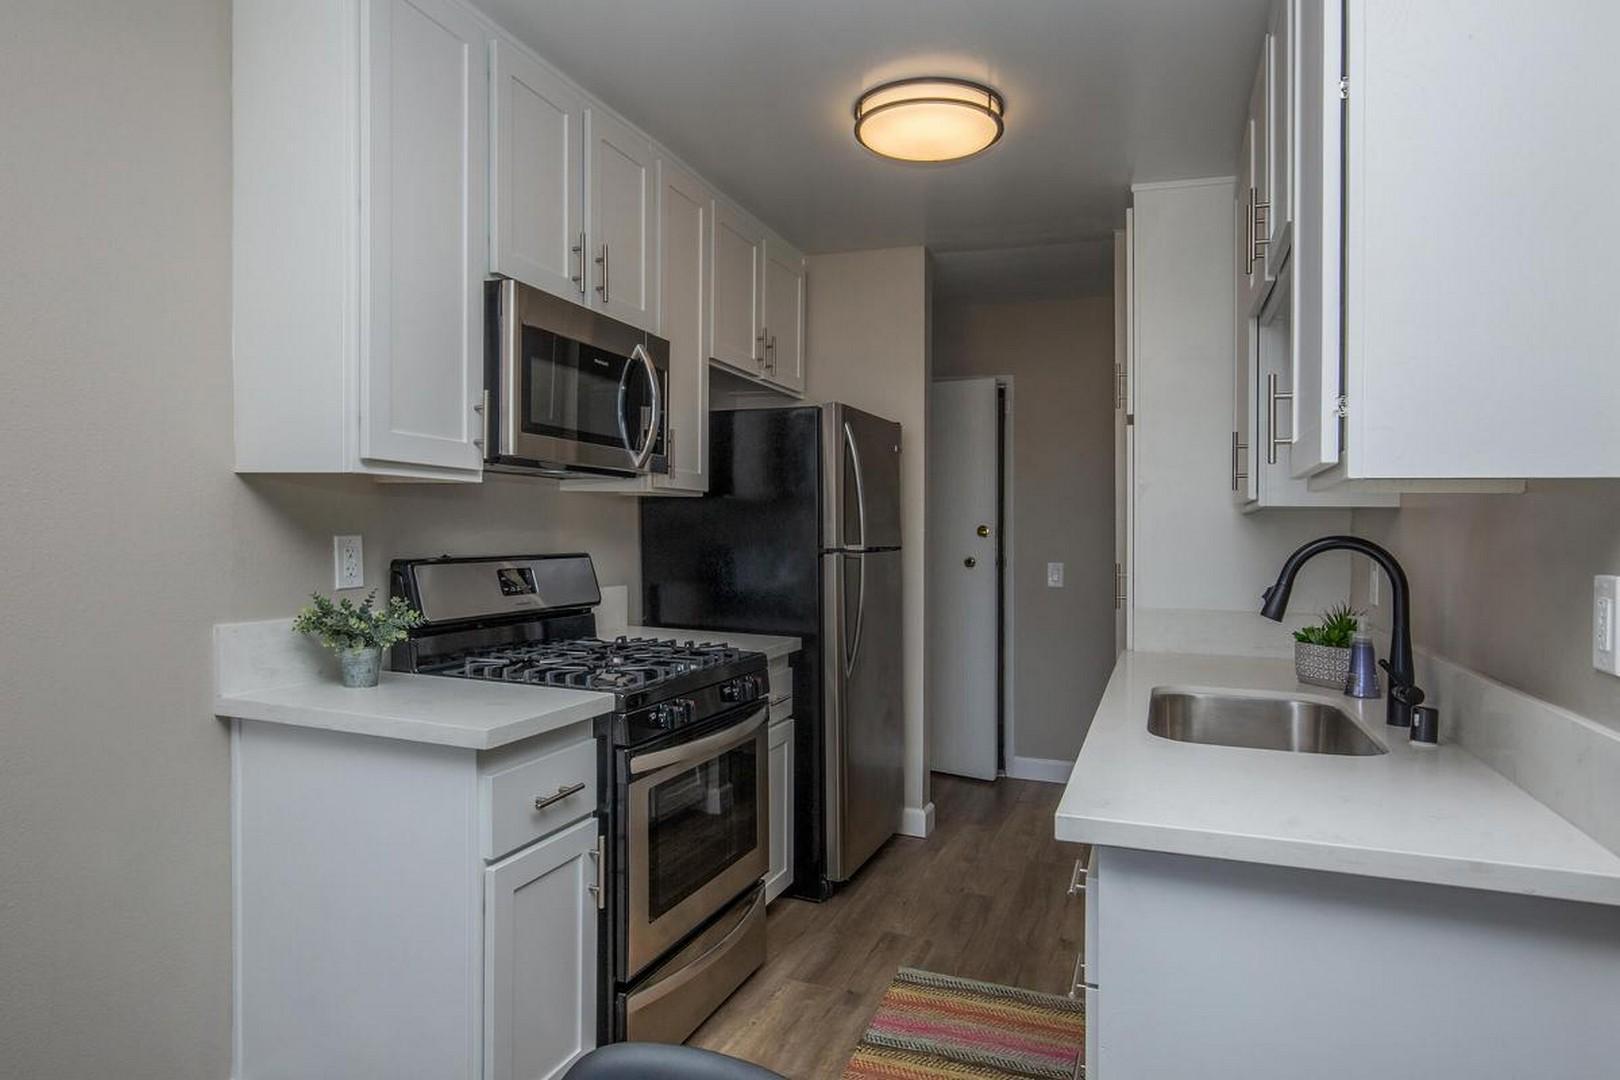 1377 E Windsor Rd #311, Glendale, CA - $1,899 USD/ month